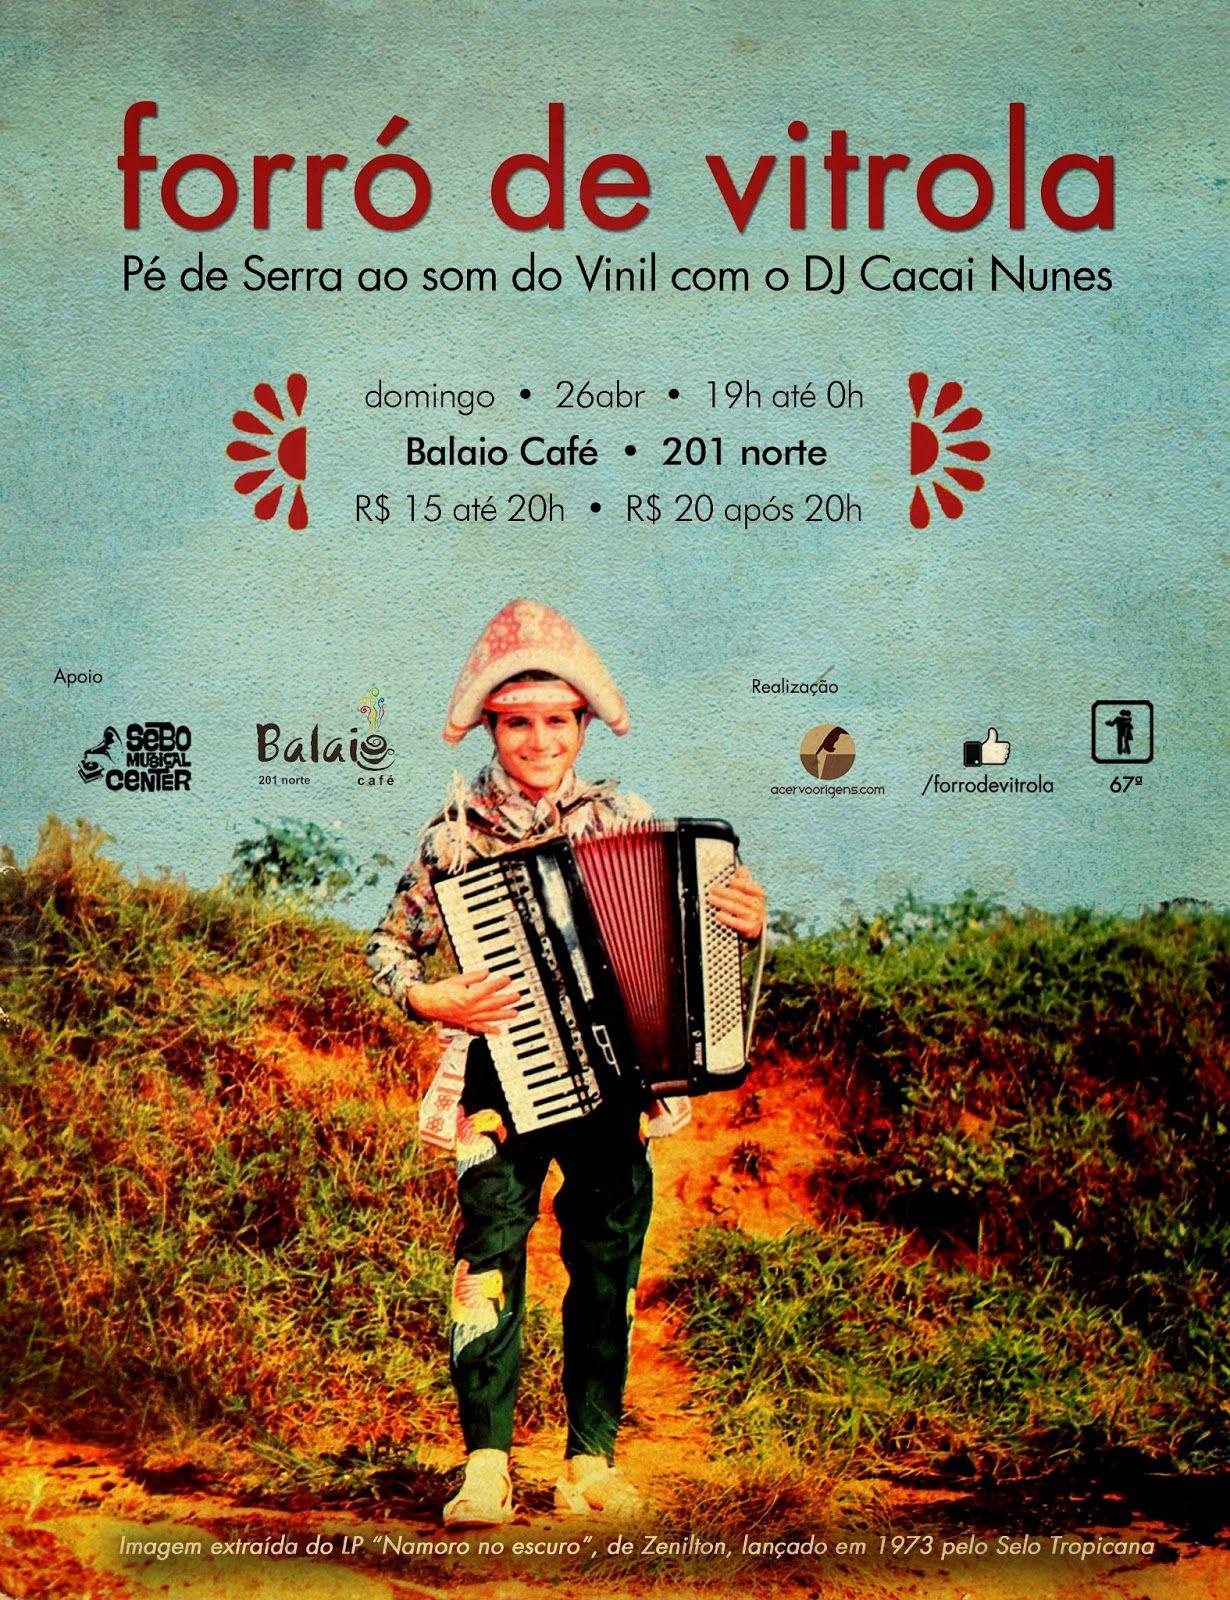 :: Acervo Origens ::: Forró de Vitrola - 67º baile - 26abr15